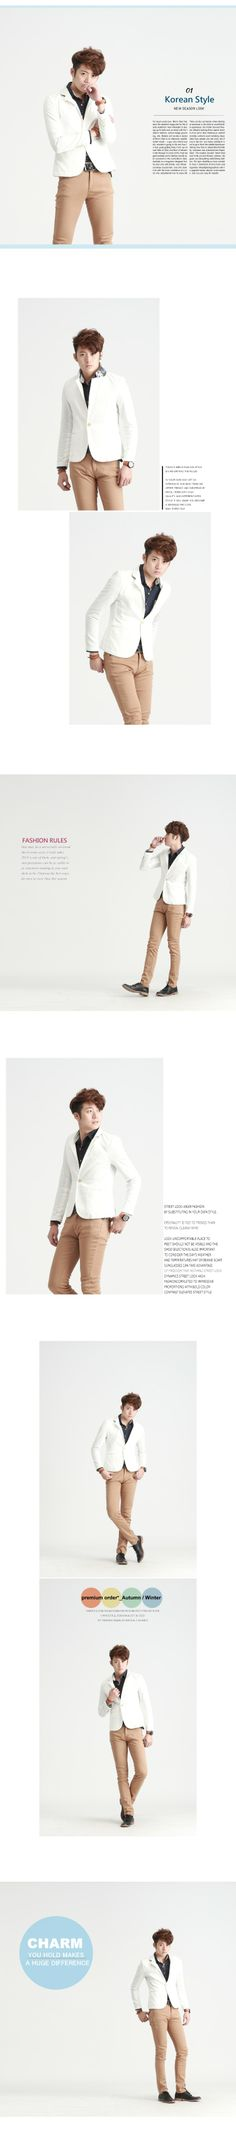 hyoyeon datira jay kim